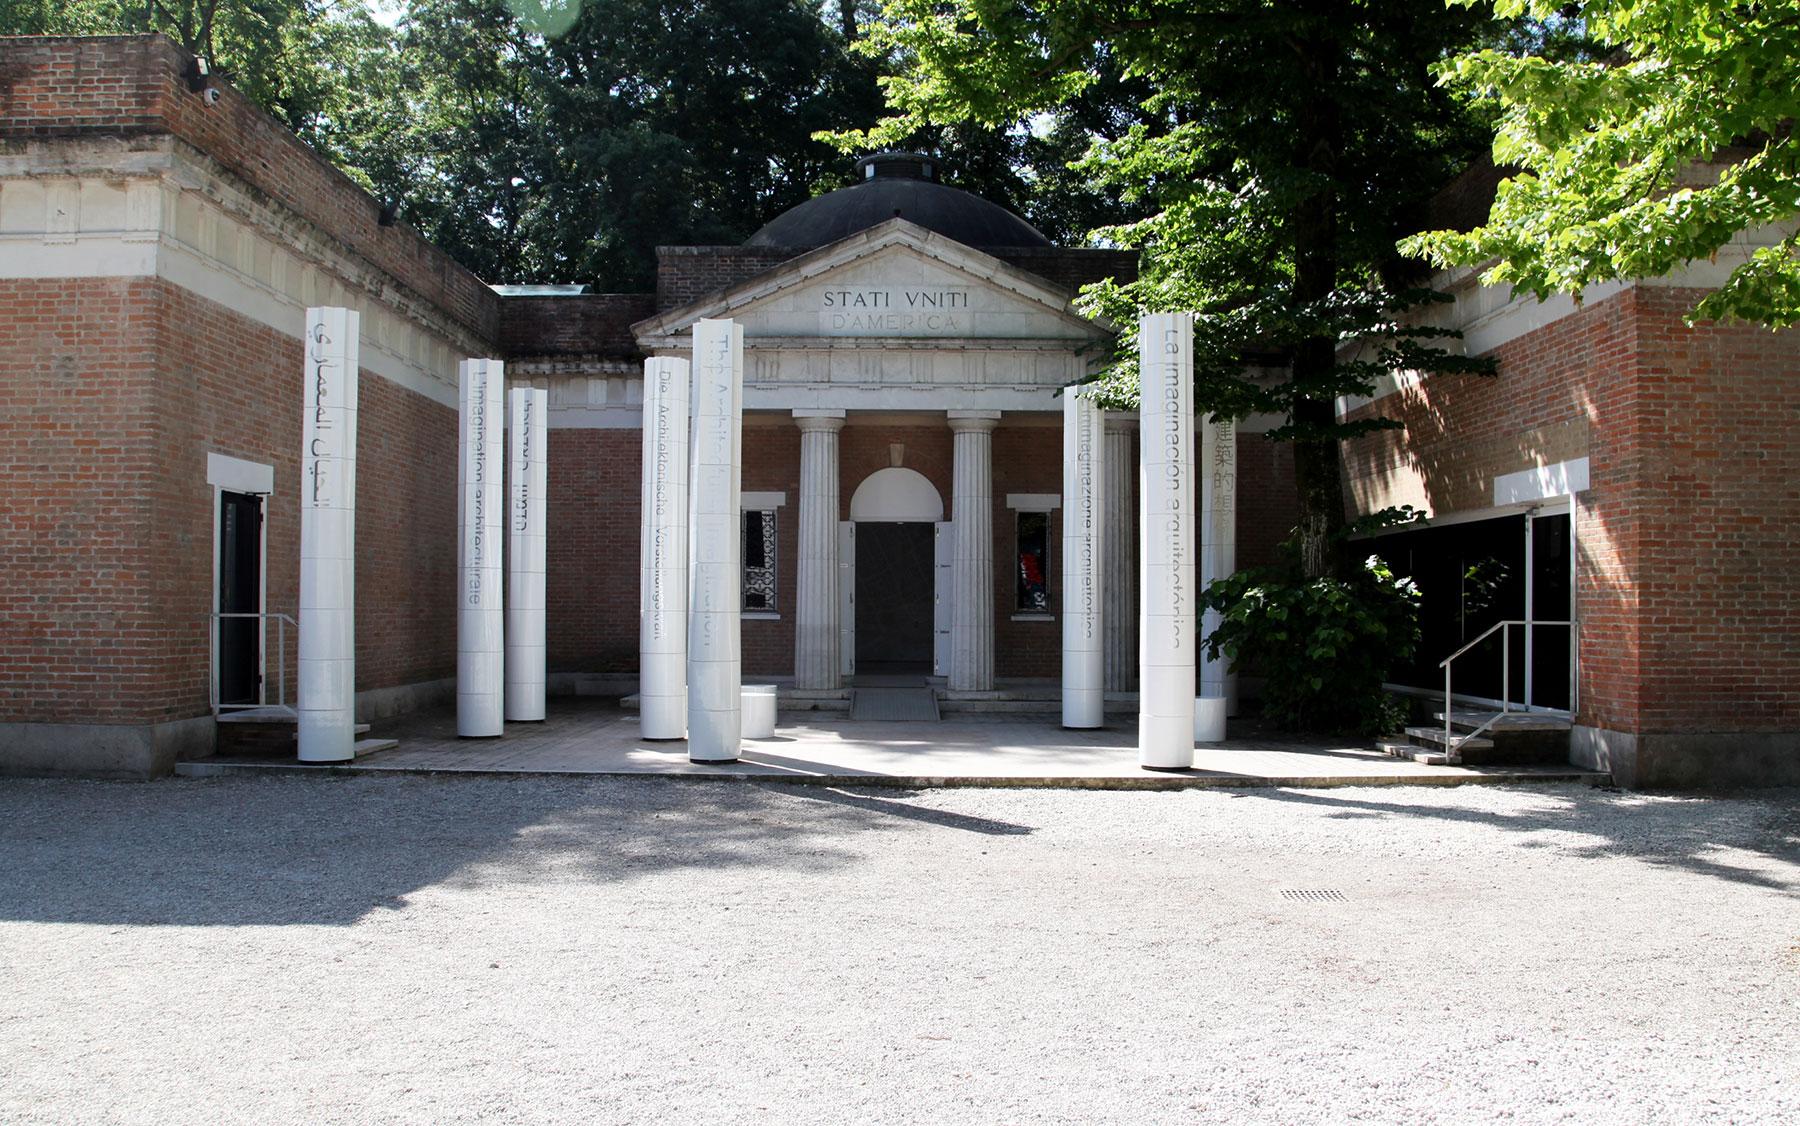 US Pavilion exterior view, 2015, Venice Architecture Biennale, Venice, Italy. Photo: Salam Rida